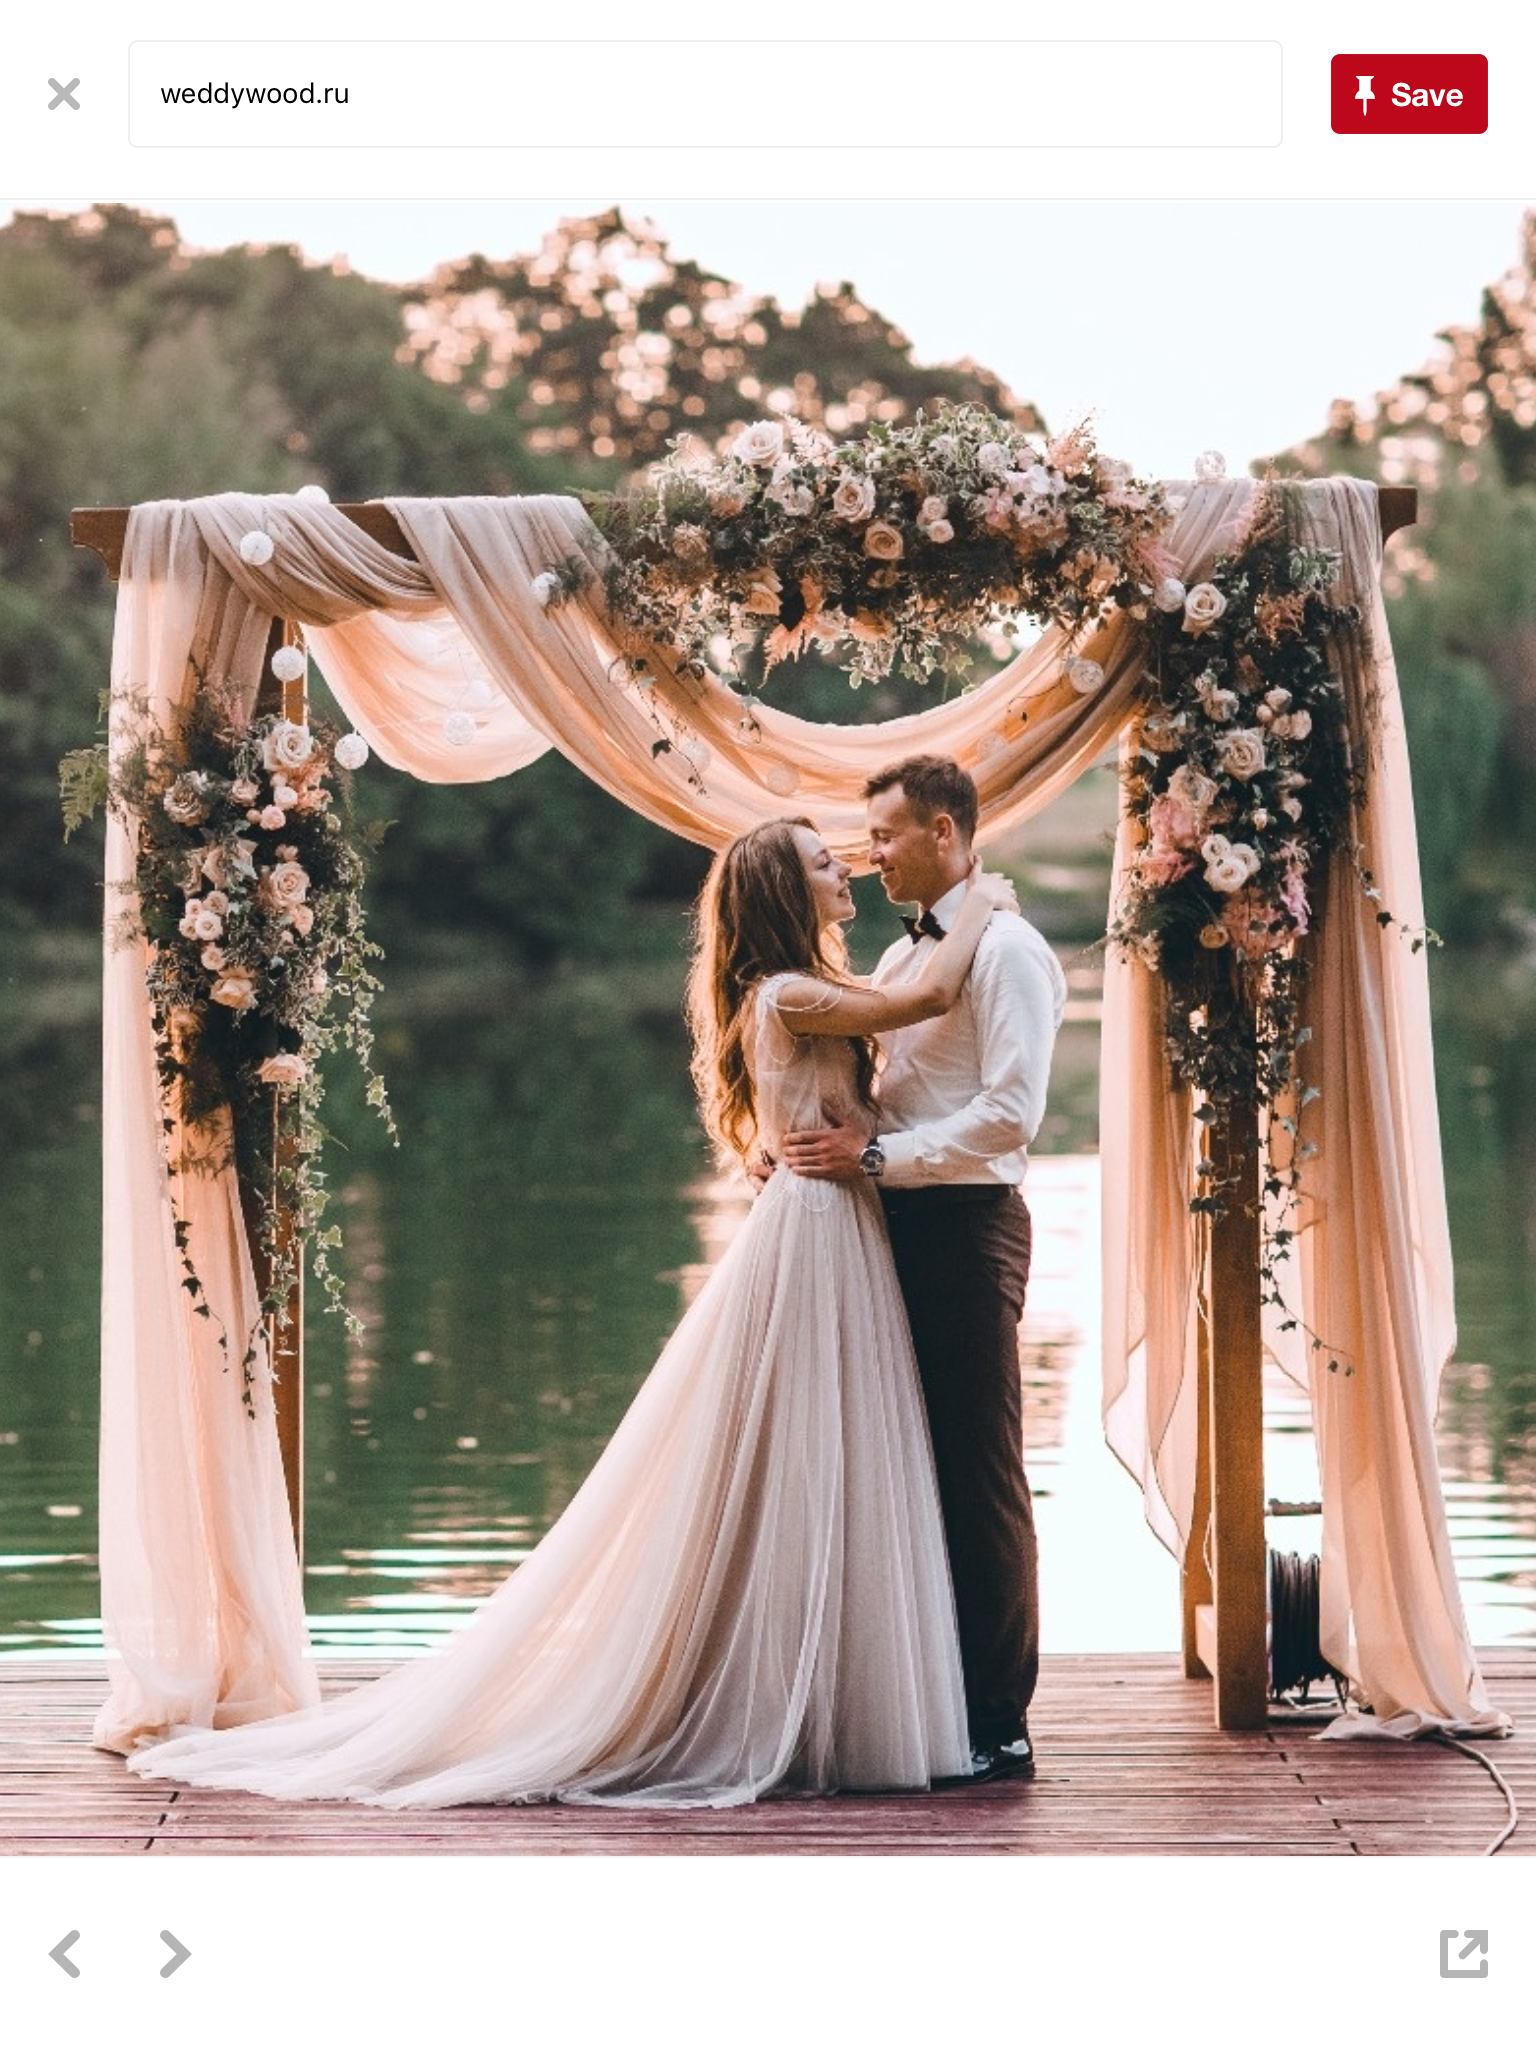 Katerinekosivchenko wedding planning pinterest wedding